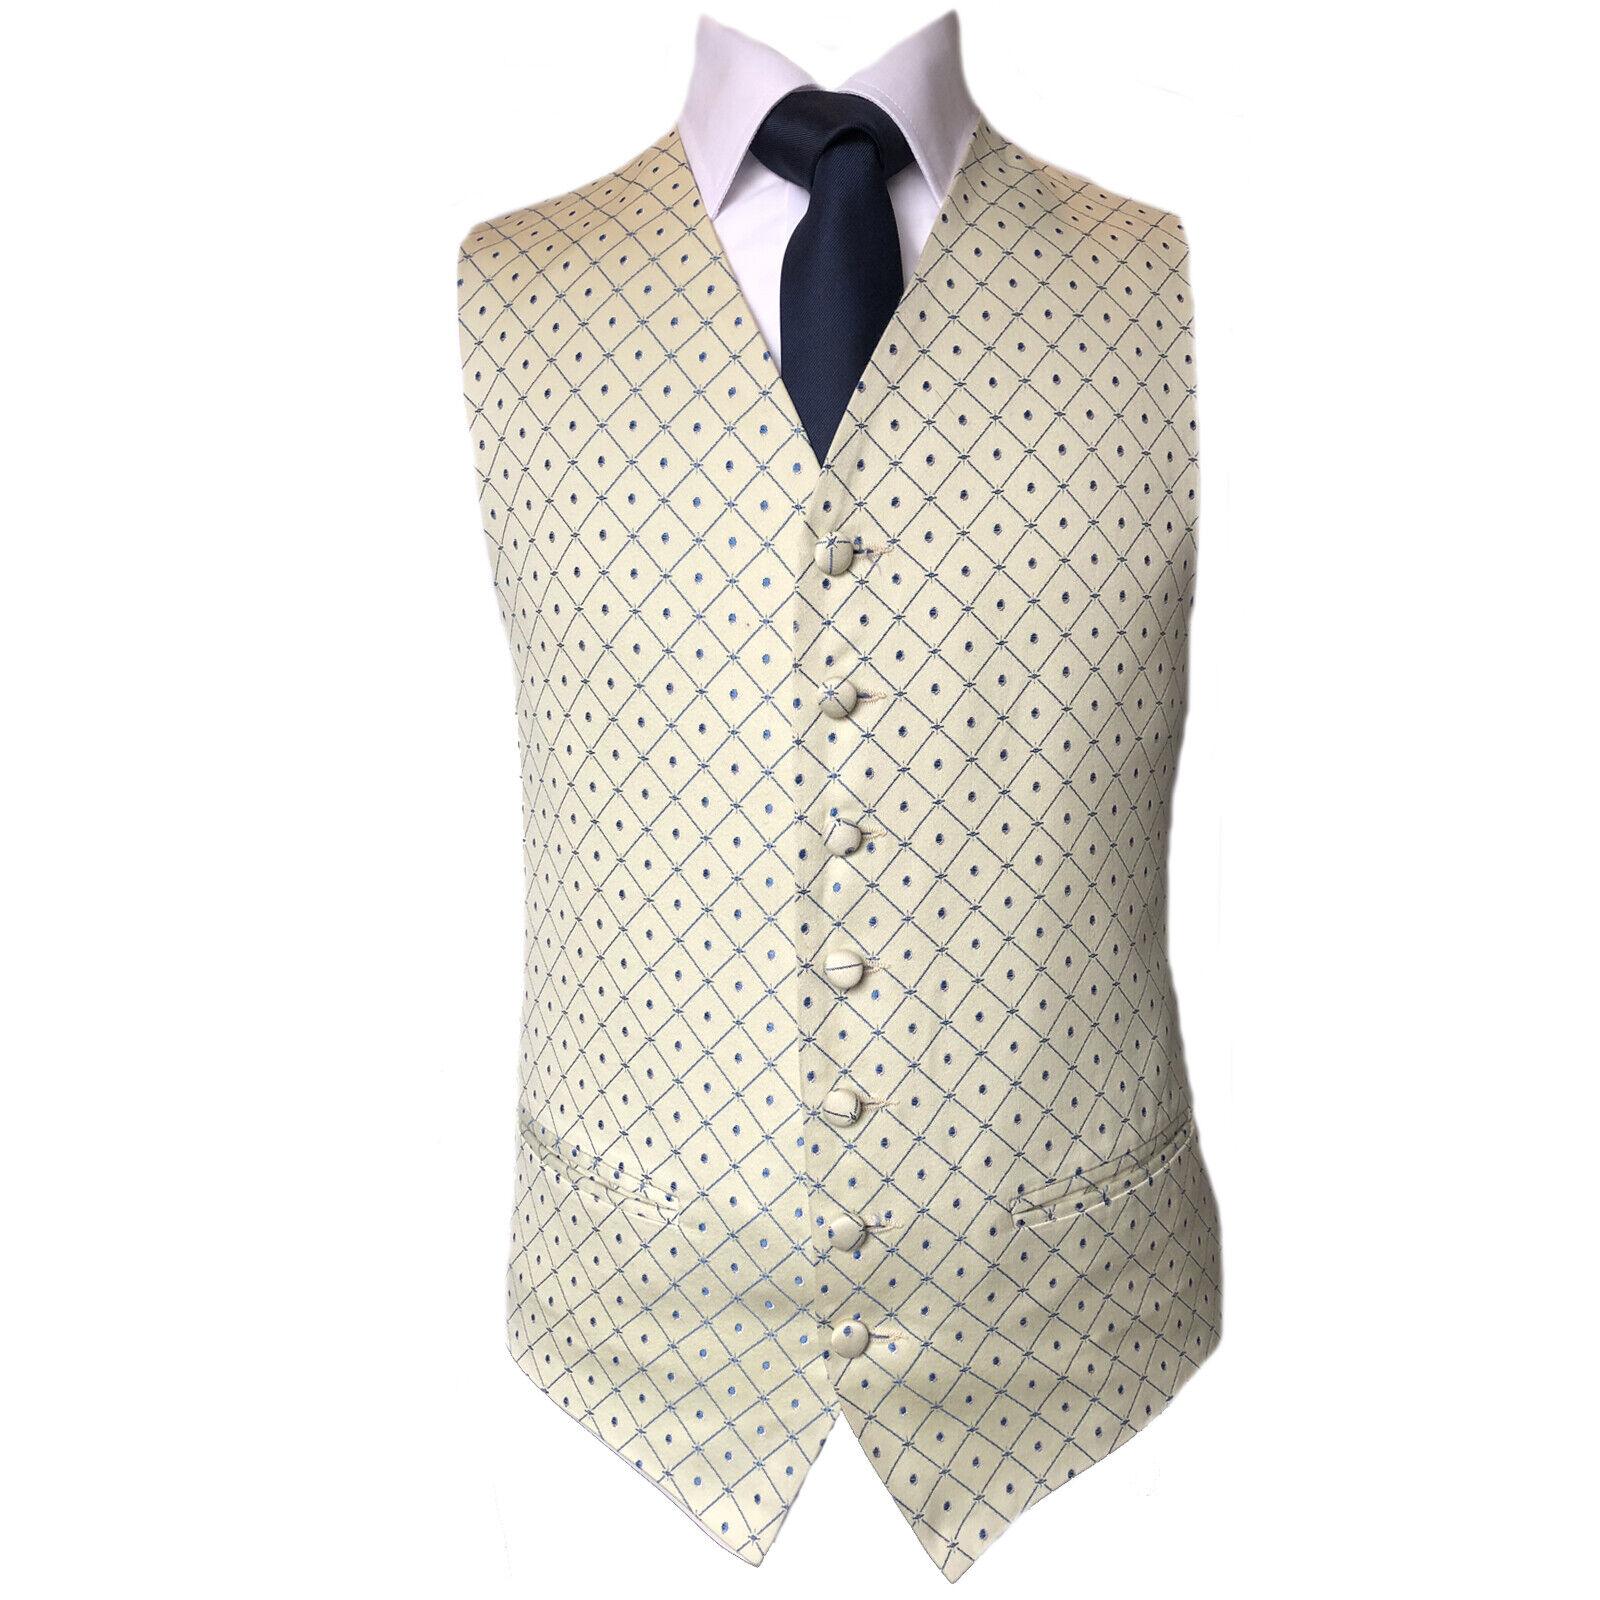 Blue Diamond Ivory Waistcoat Vest Wedding Formal UK Men's (A58)